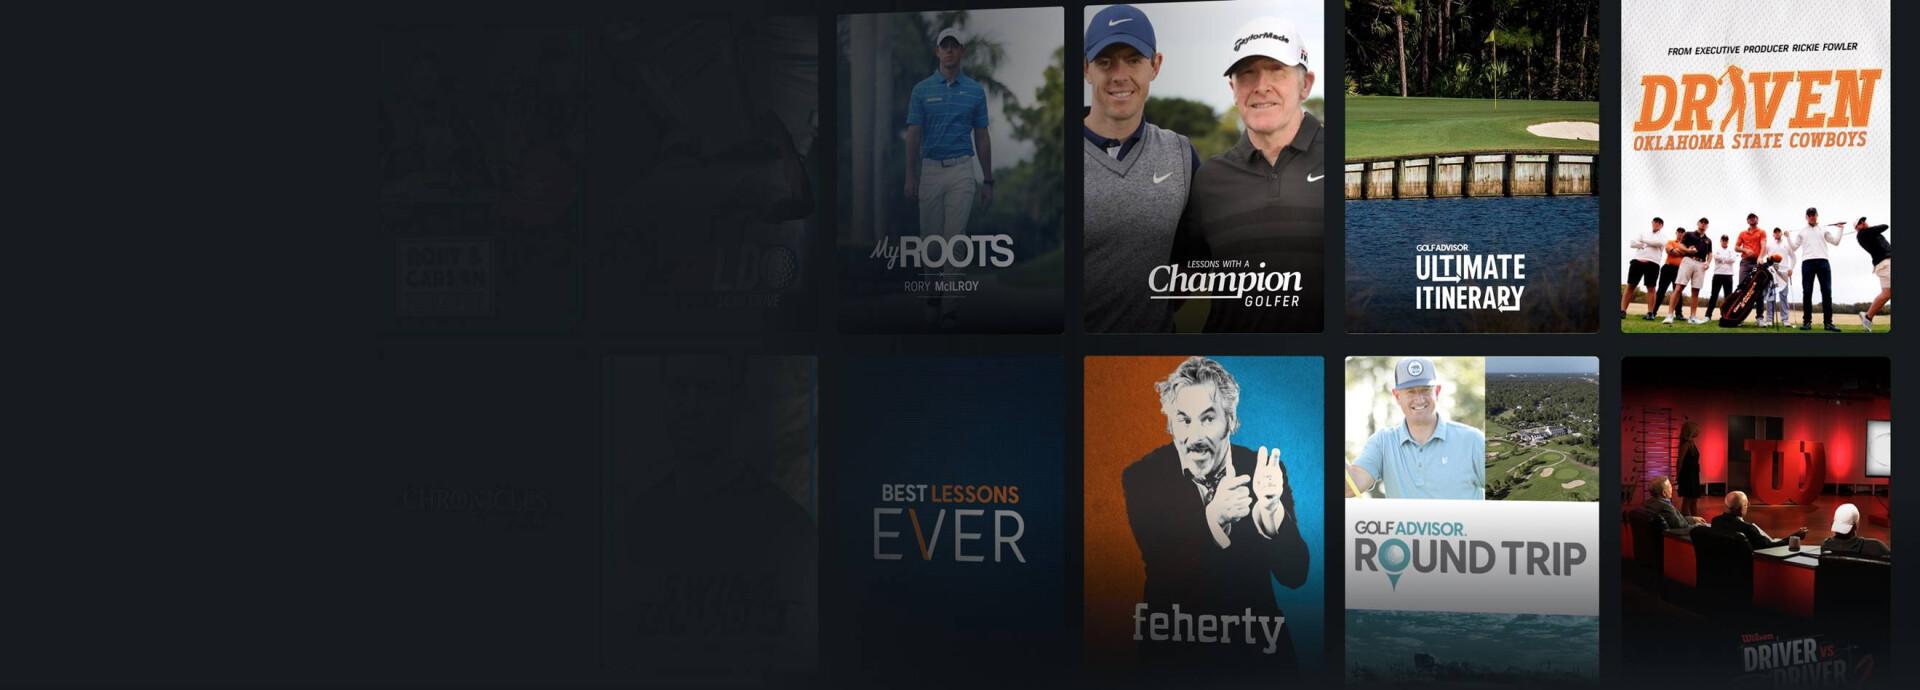 GolfPass Show poster lead